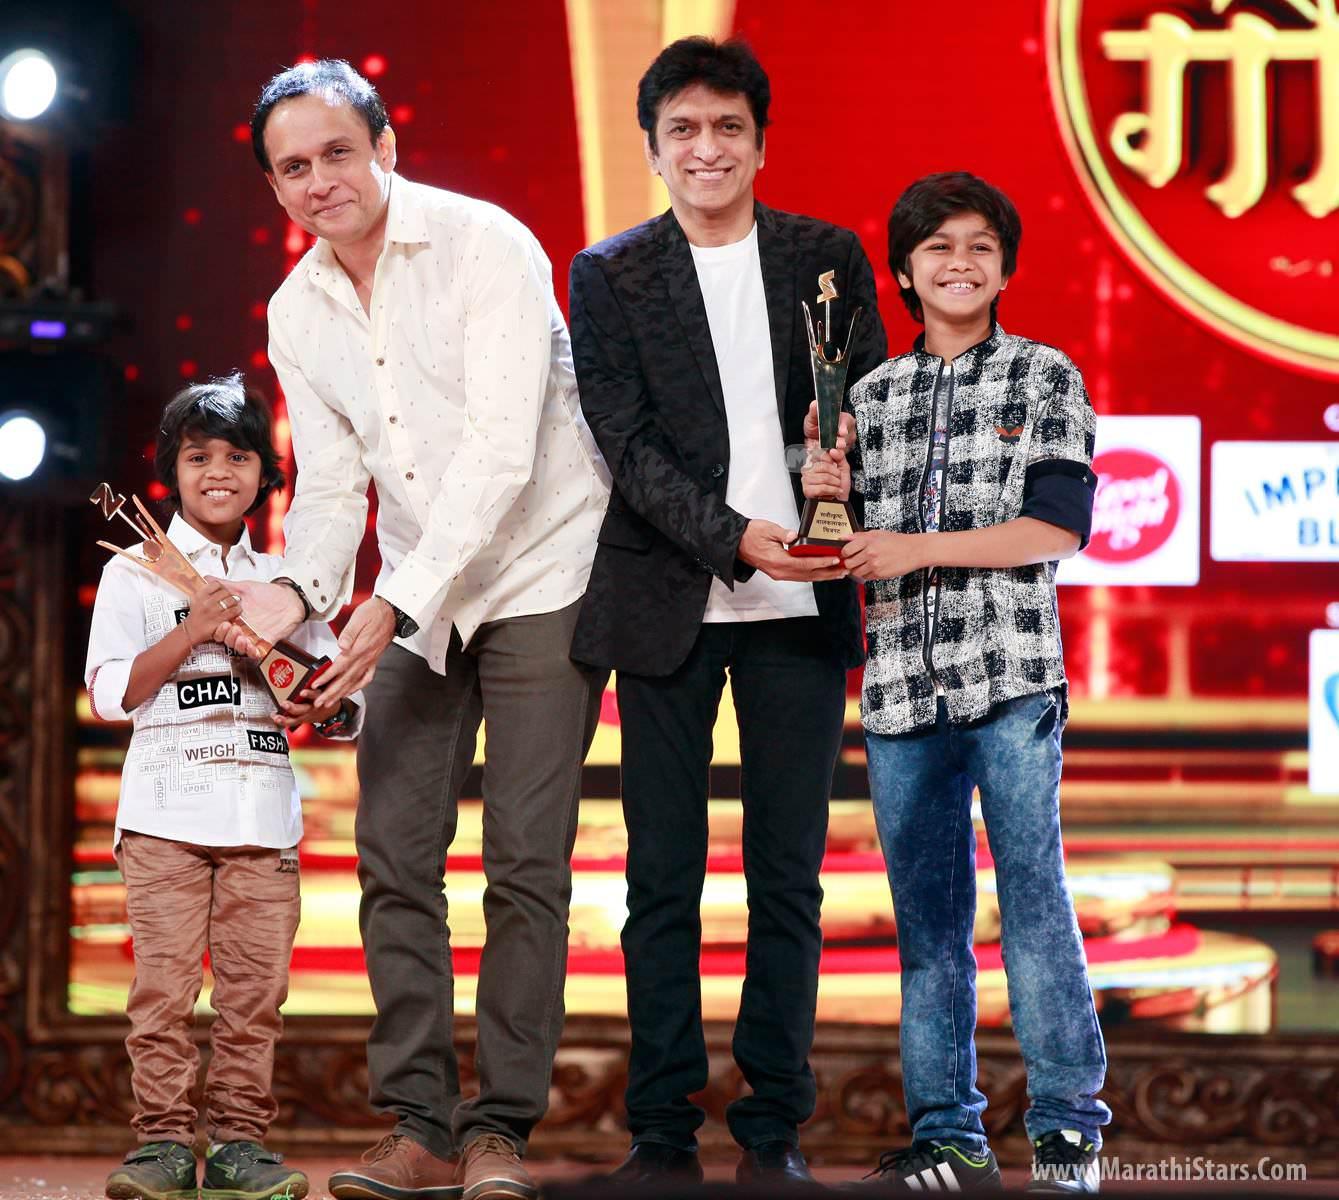 Zee Chitra Gaurav 2017 : Award Winners List & Photos